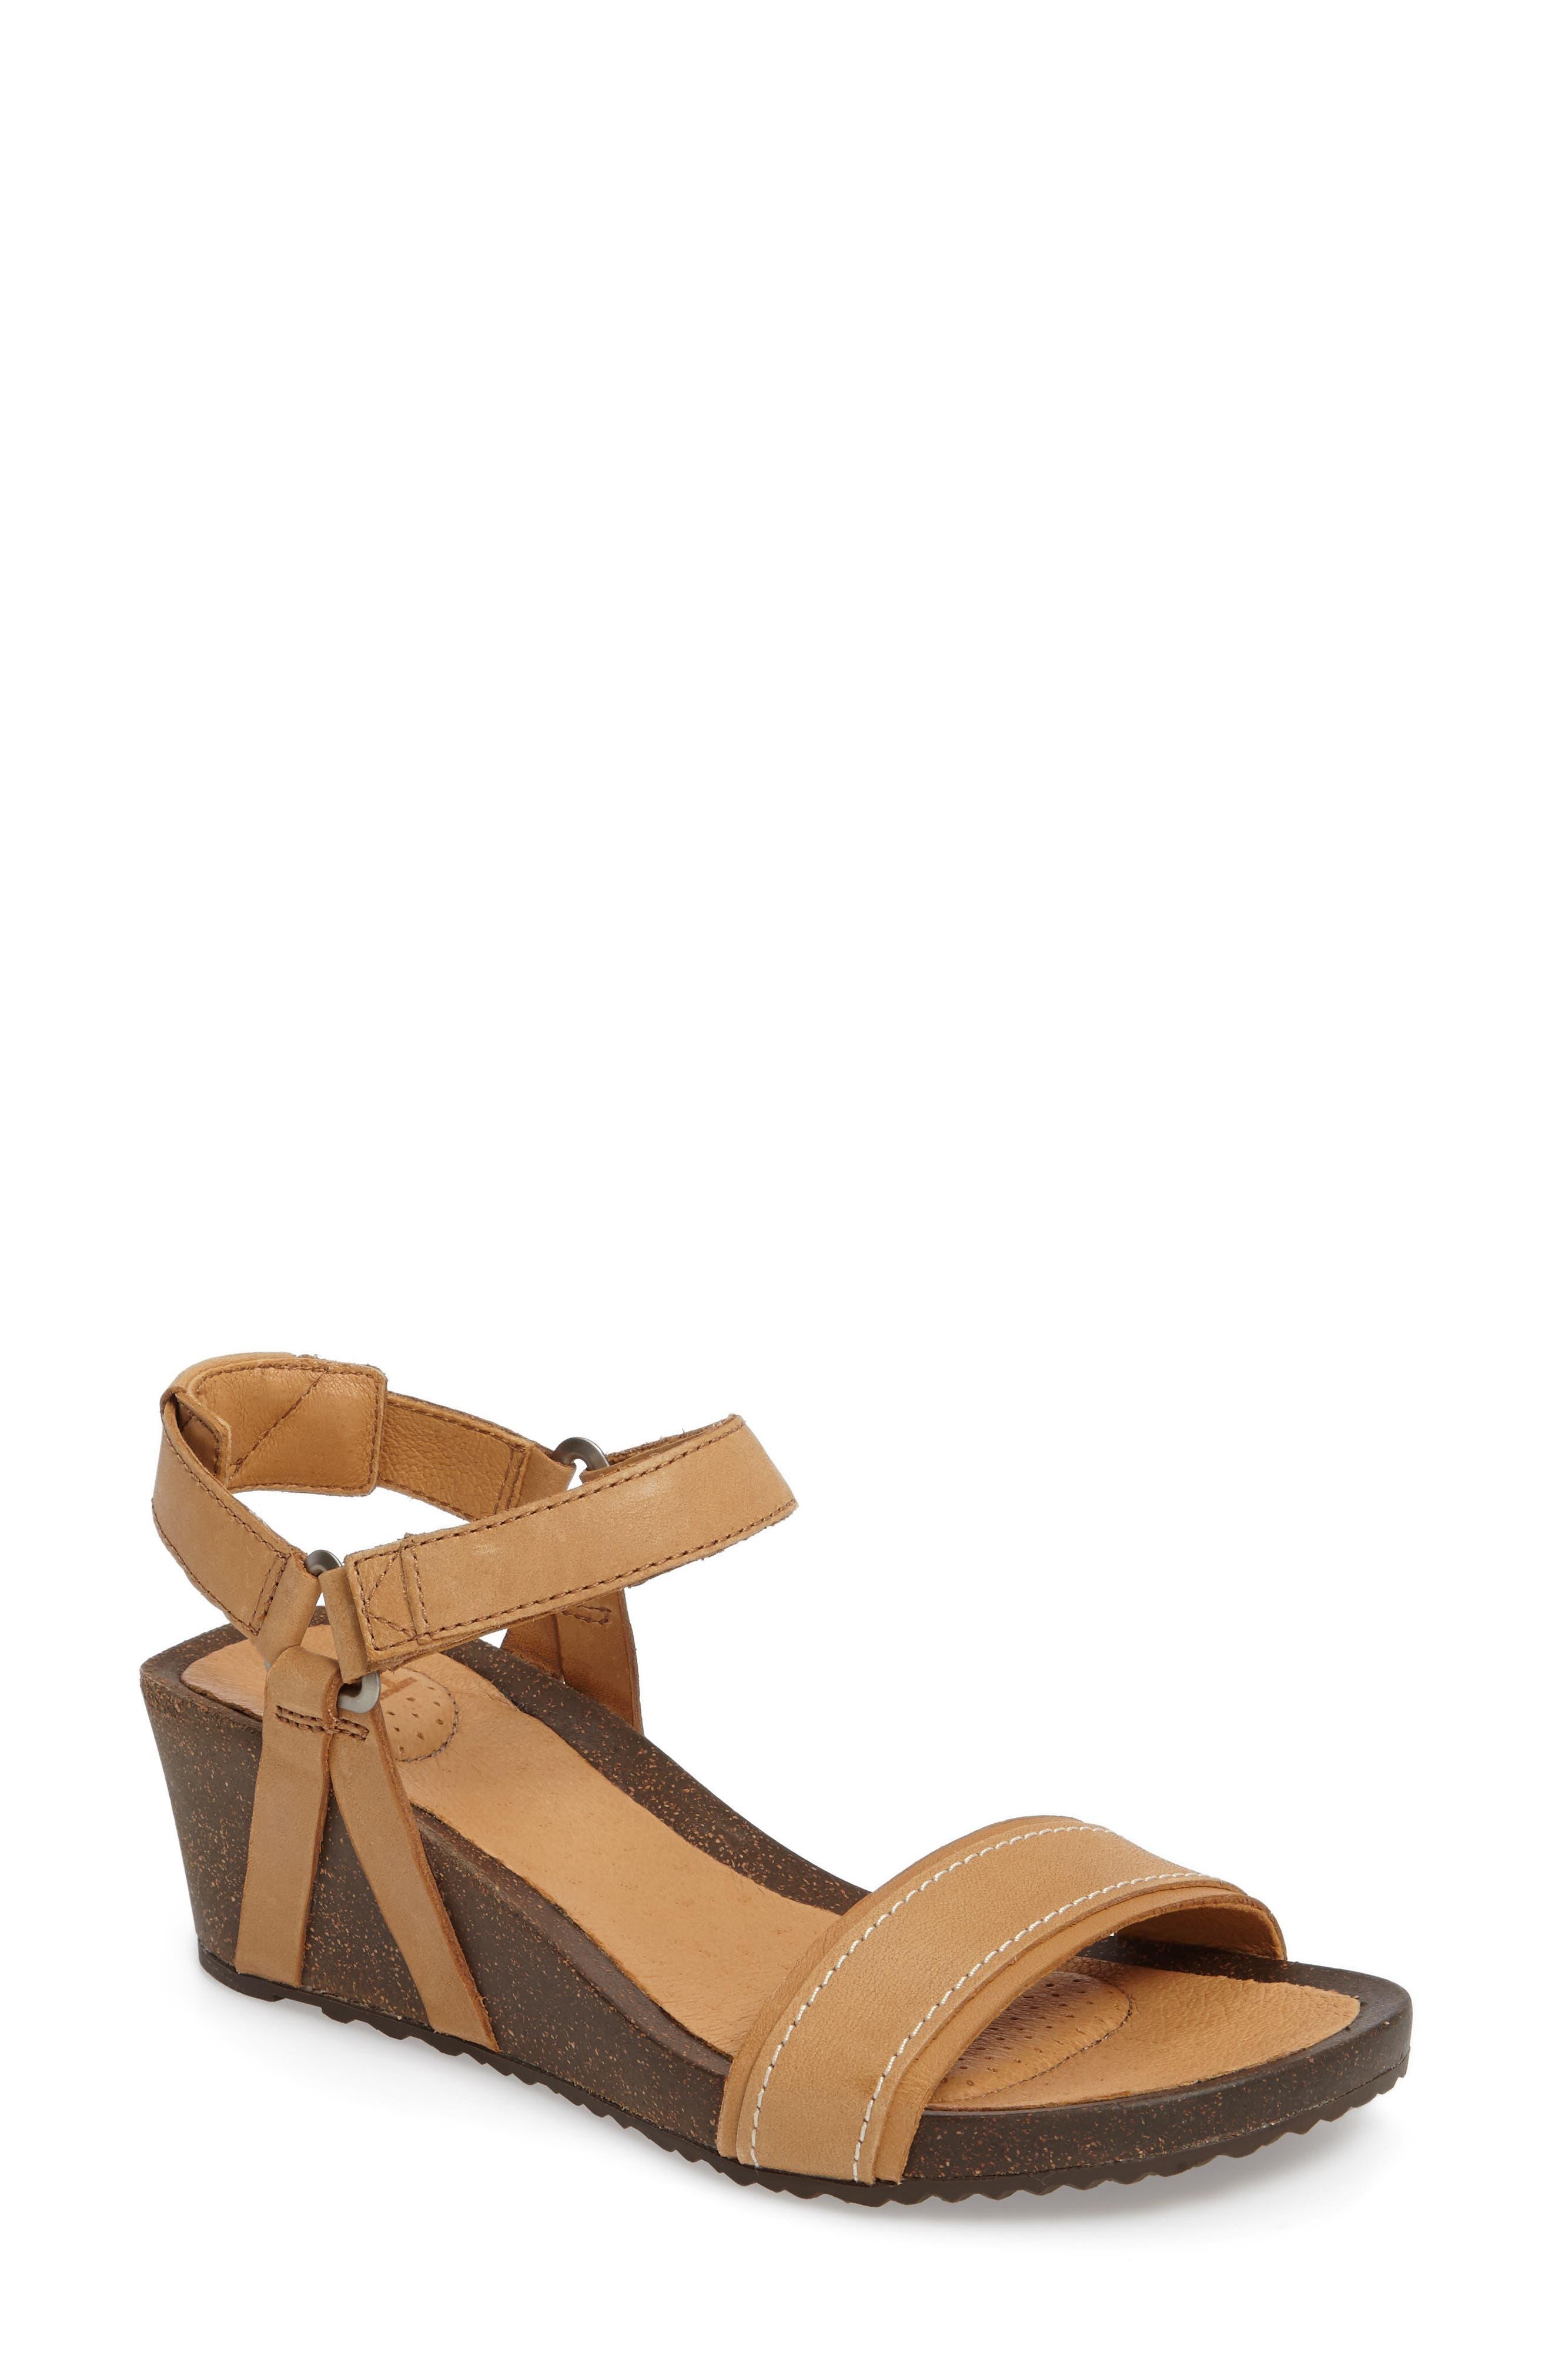 Alternate Image 1 Selected - Teva Ysidro Stitch Wedge Sandal (Women)